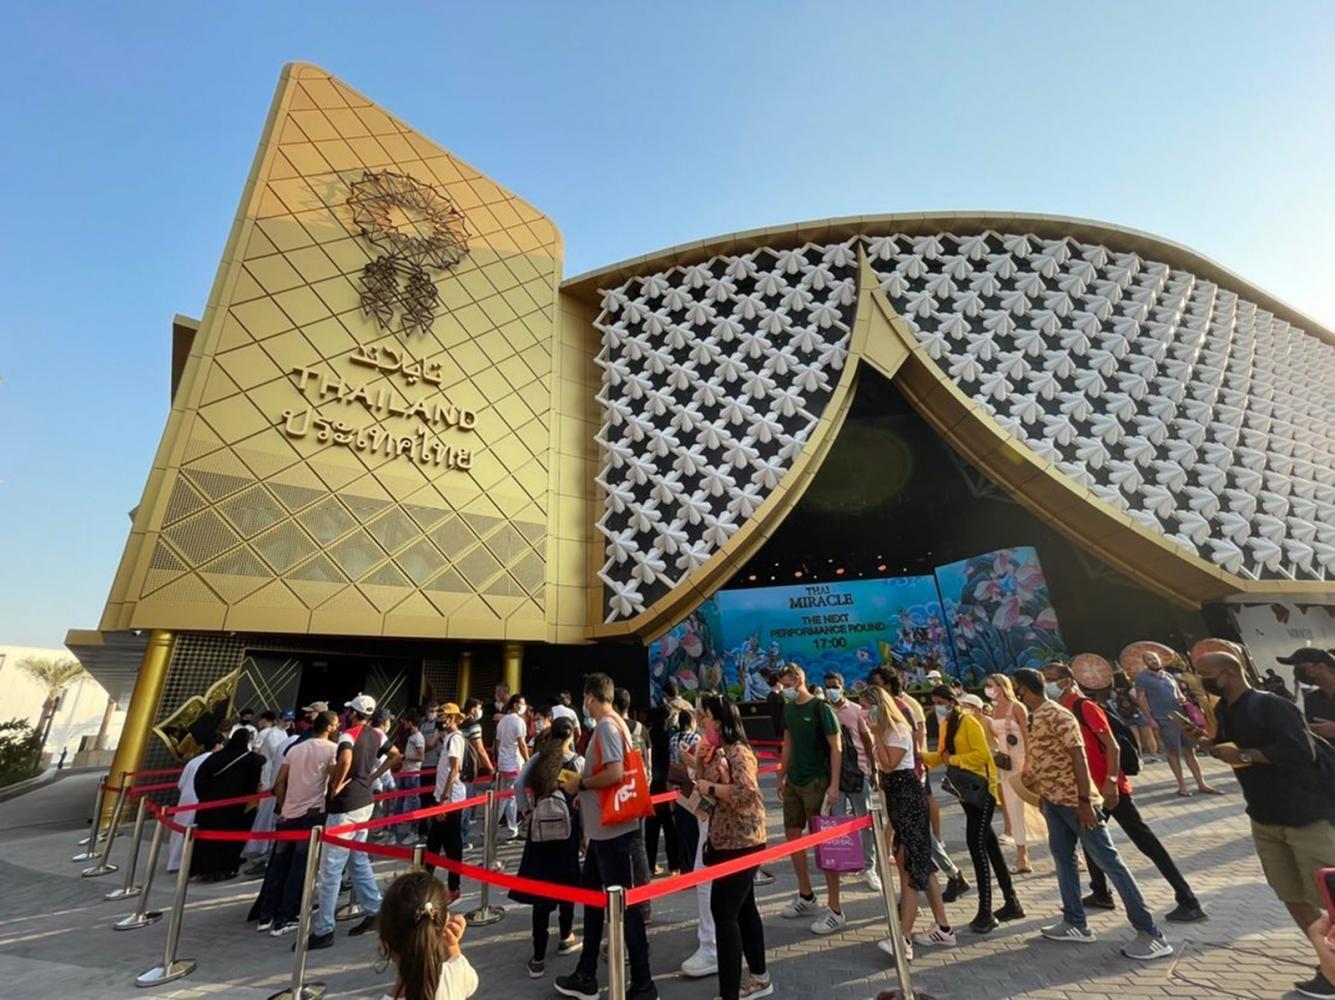 100,000 visit pavilion in Dubai